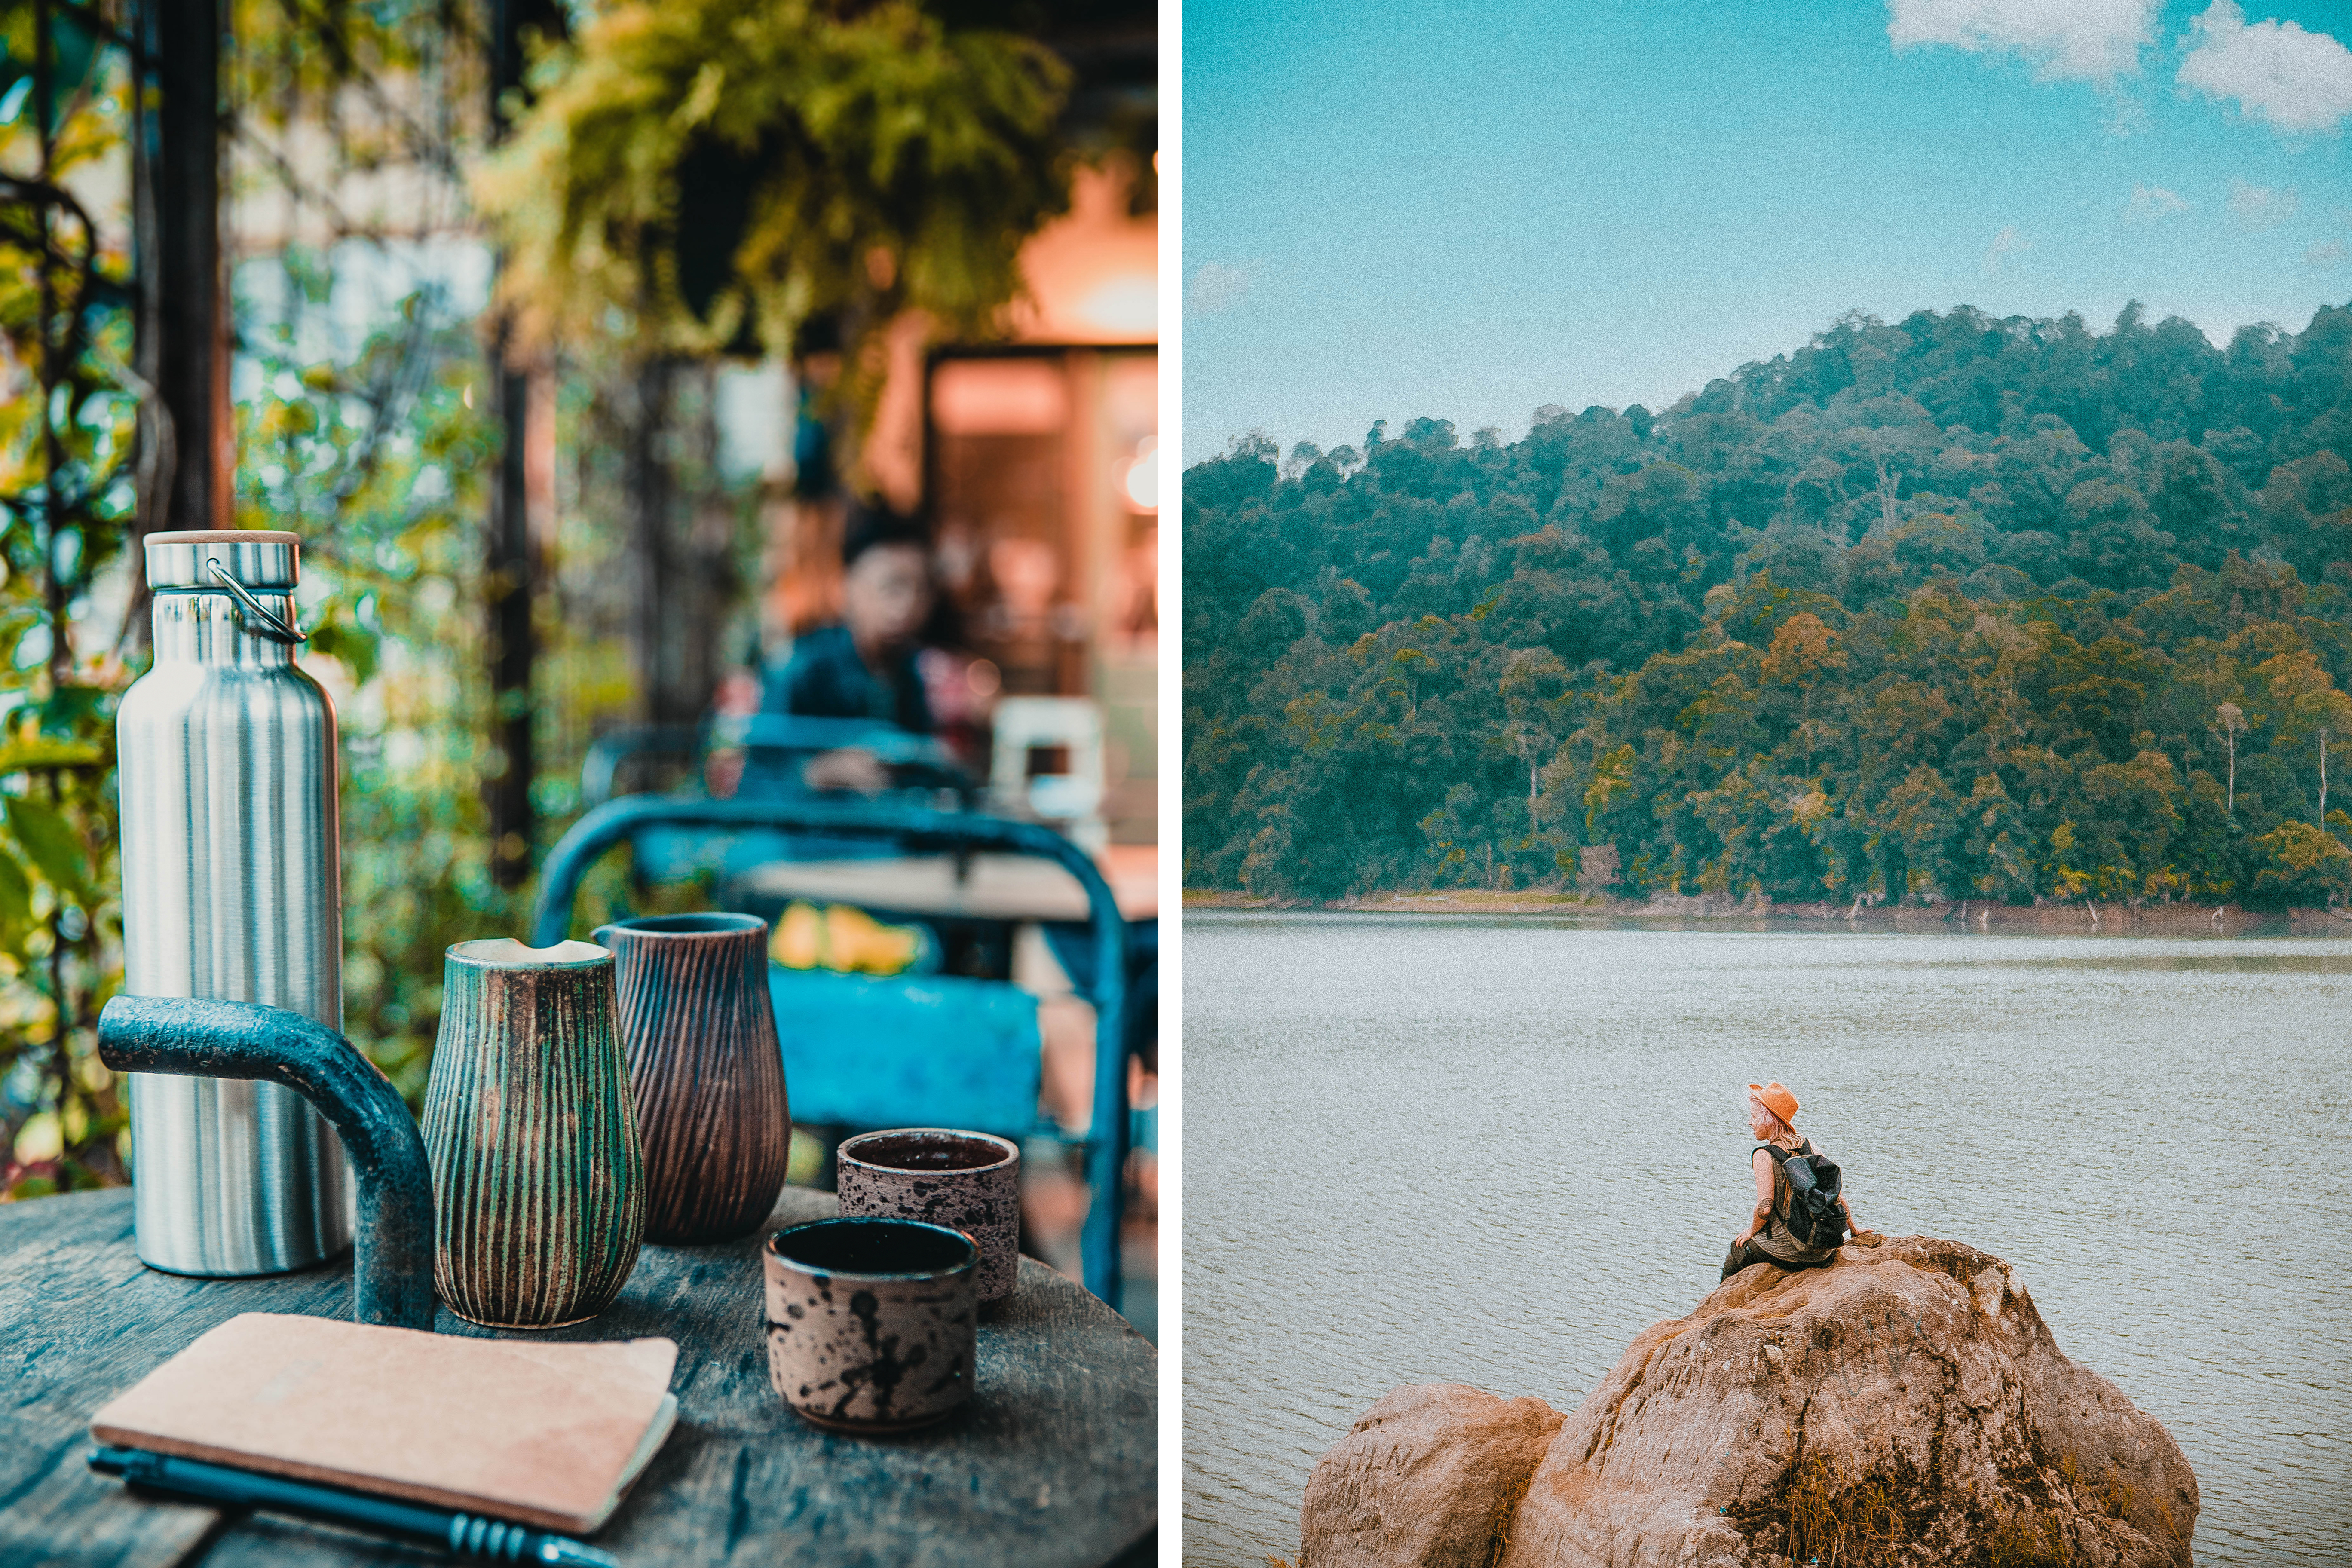 coffee shop bandung blue doors indonesia relax javanese lake